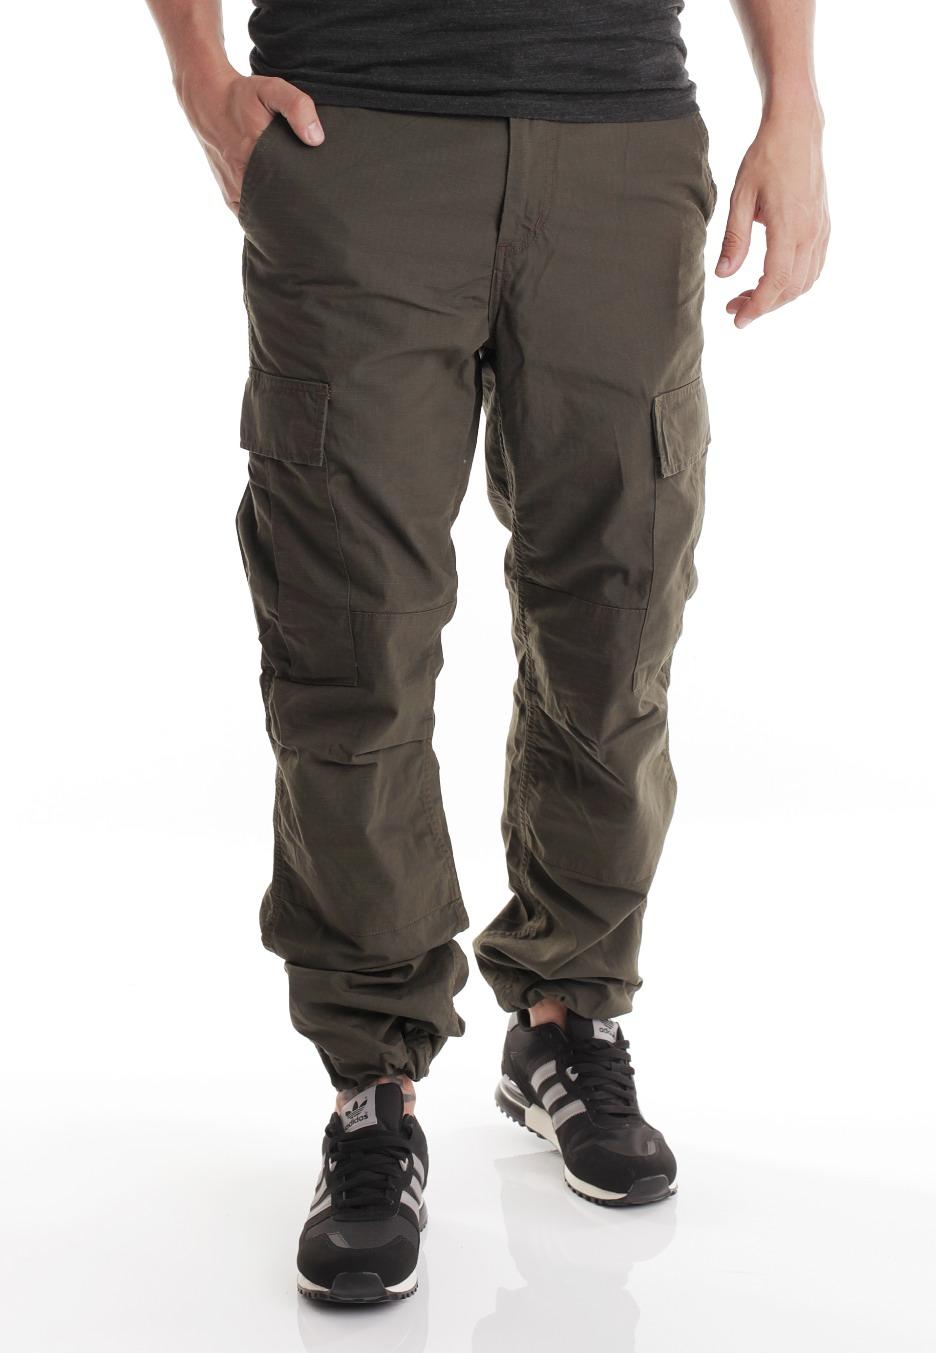 Carhartt WIP - Regular Cargo Columbia Ripstop Cypress Rinsed - Pants -  Streetwear Shop - Impericon.com Worldwide 9bb5a0913